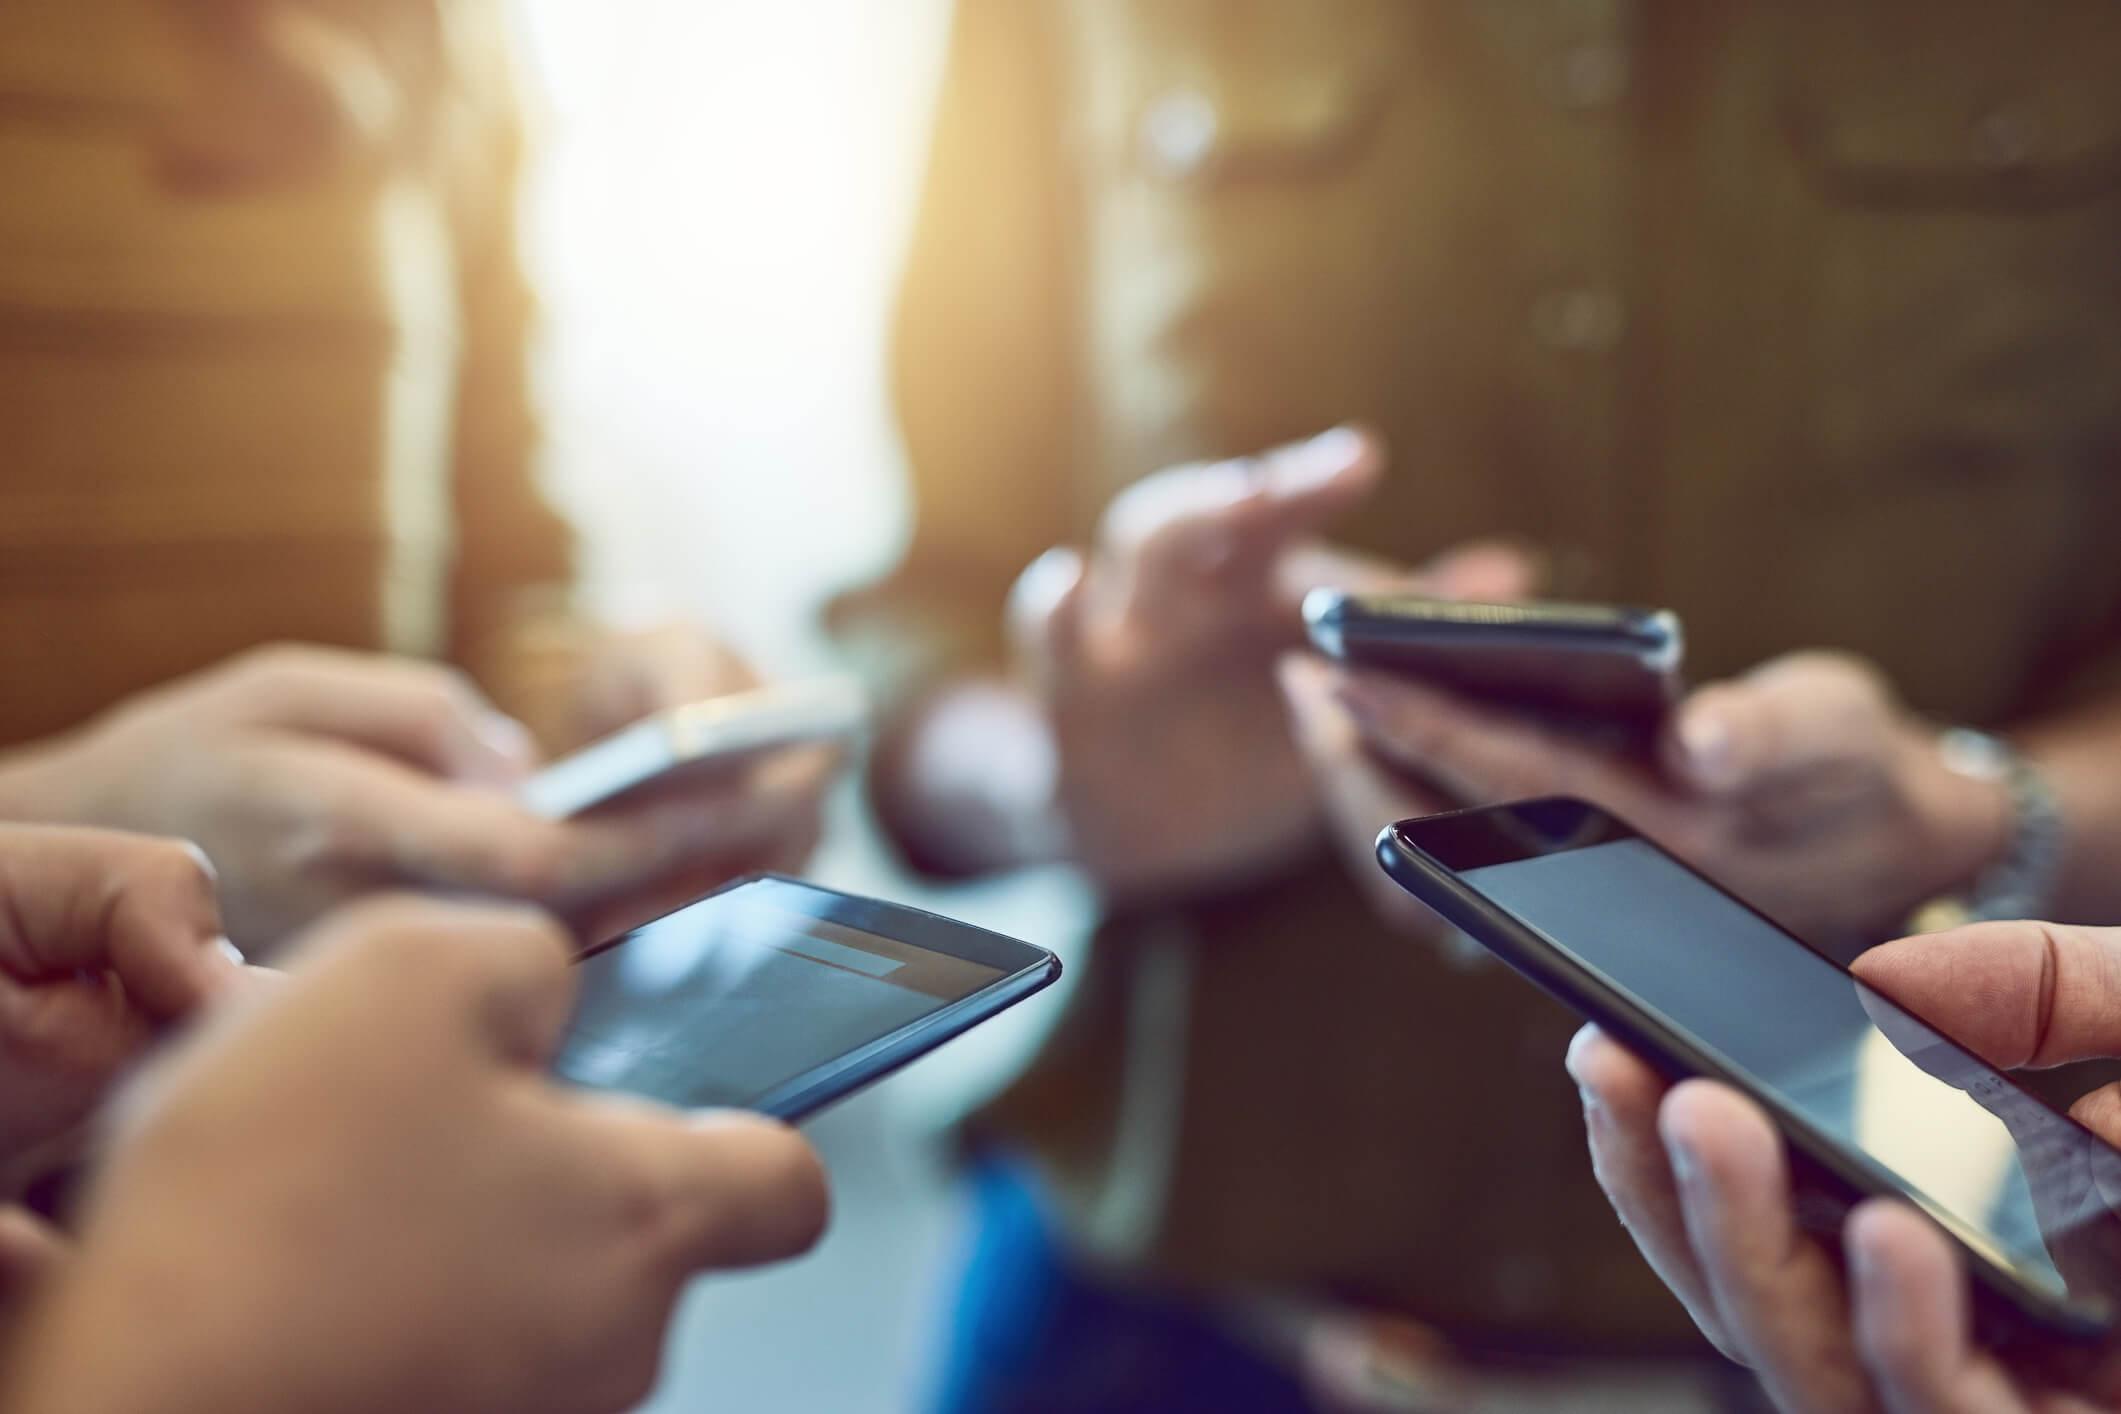 marketing-nas-redes-sociais-6-tendencias-para-dominar-a-internet.jpeg